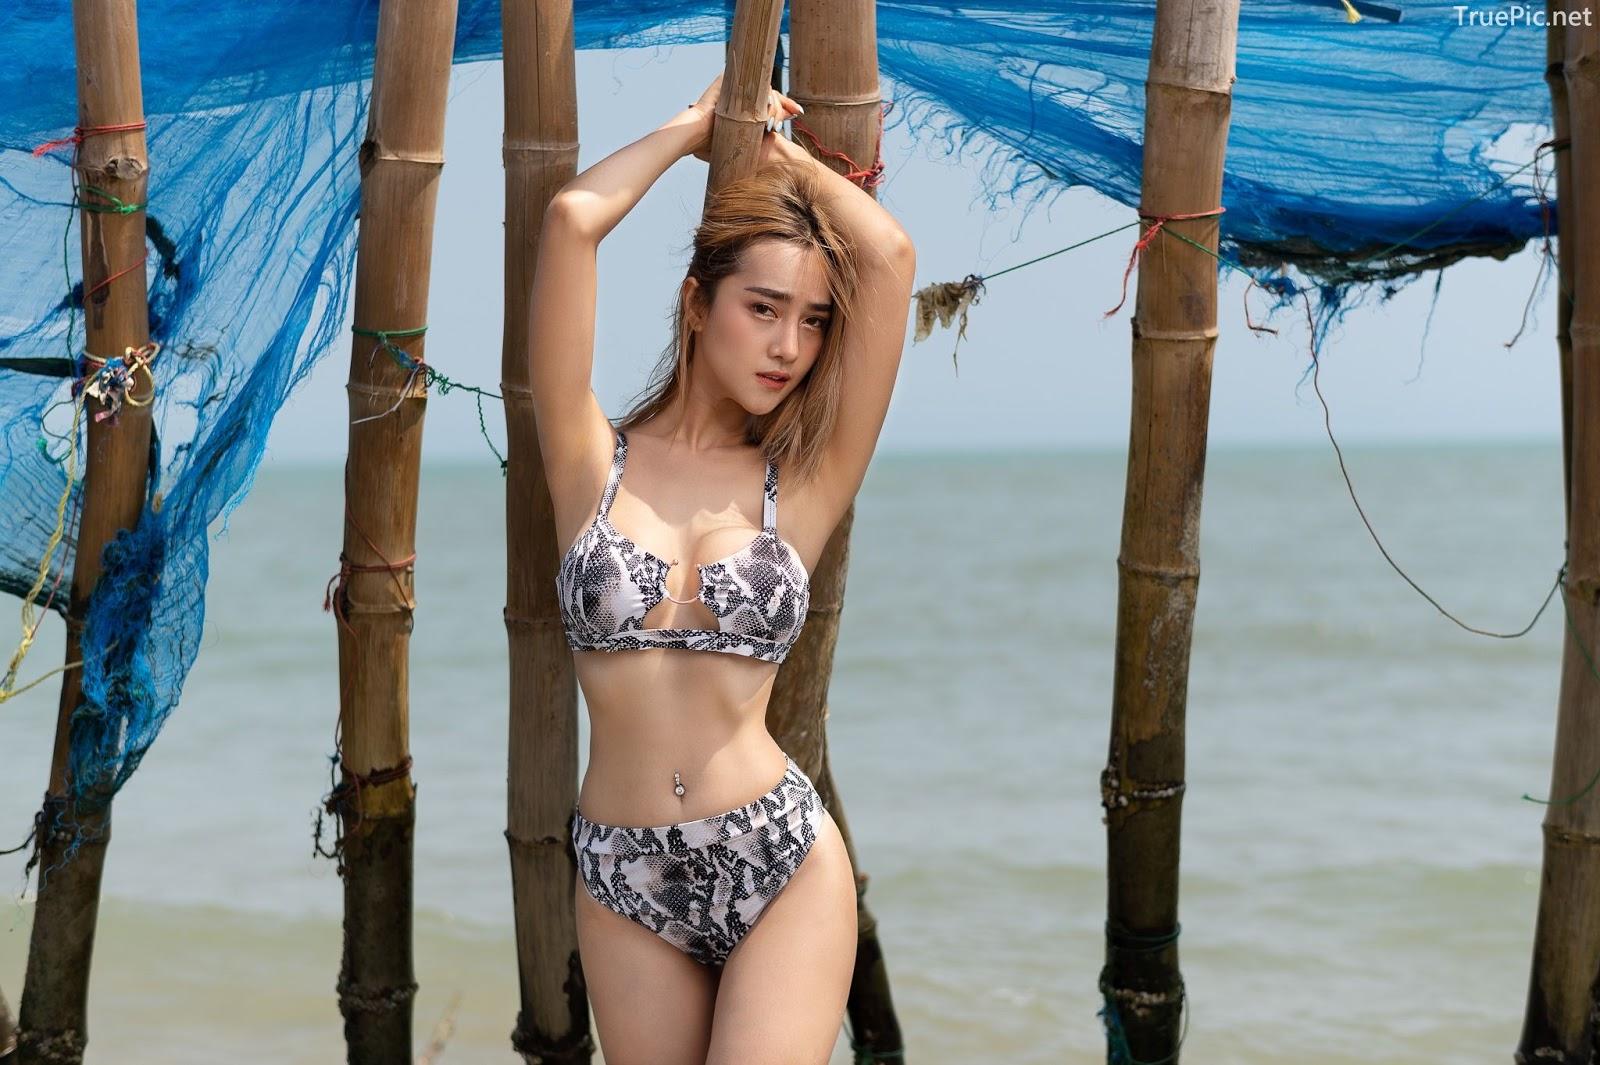 Thailand Hot Model - YingGy Ponjuree - Sea Vibes and Snakeskin Bikini - TruePic.net - Picture 10